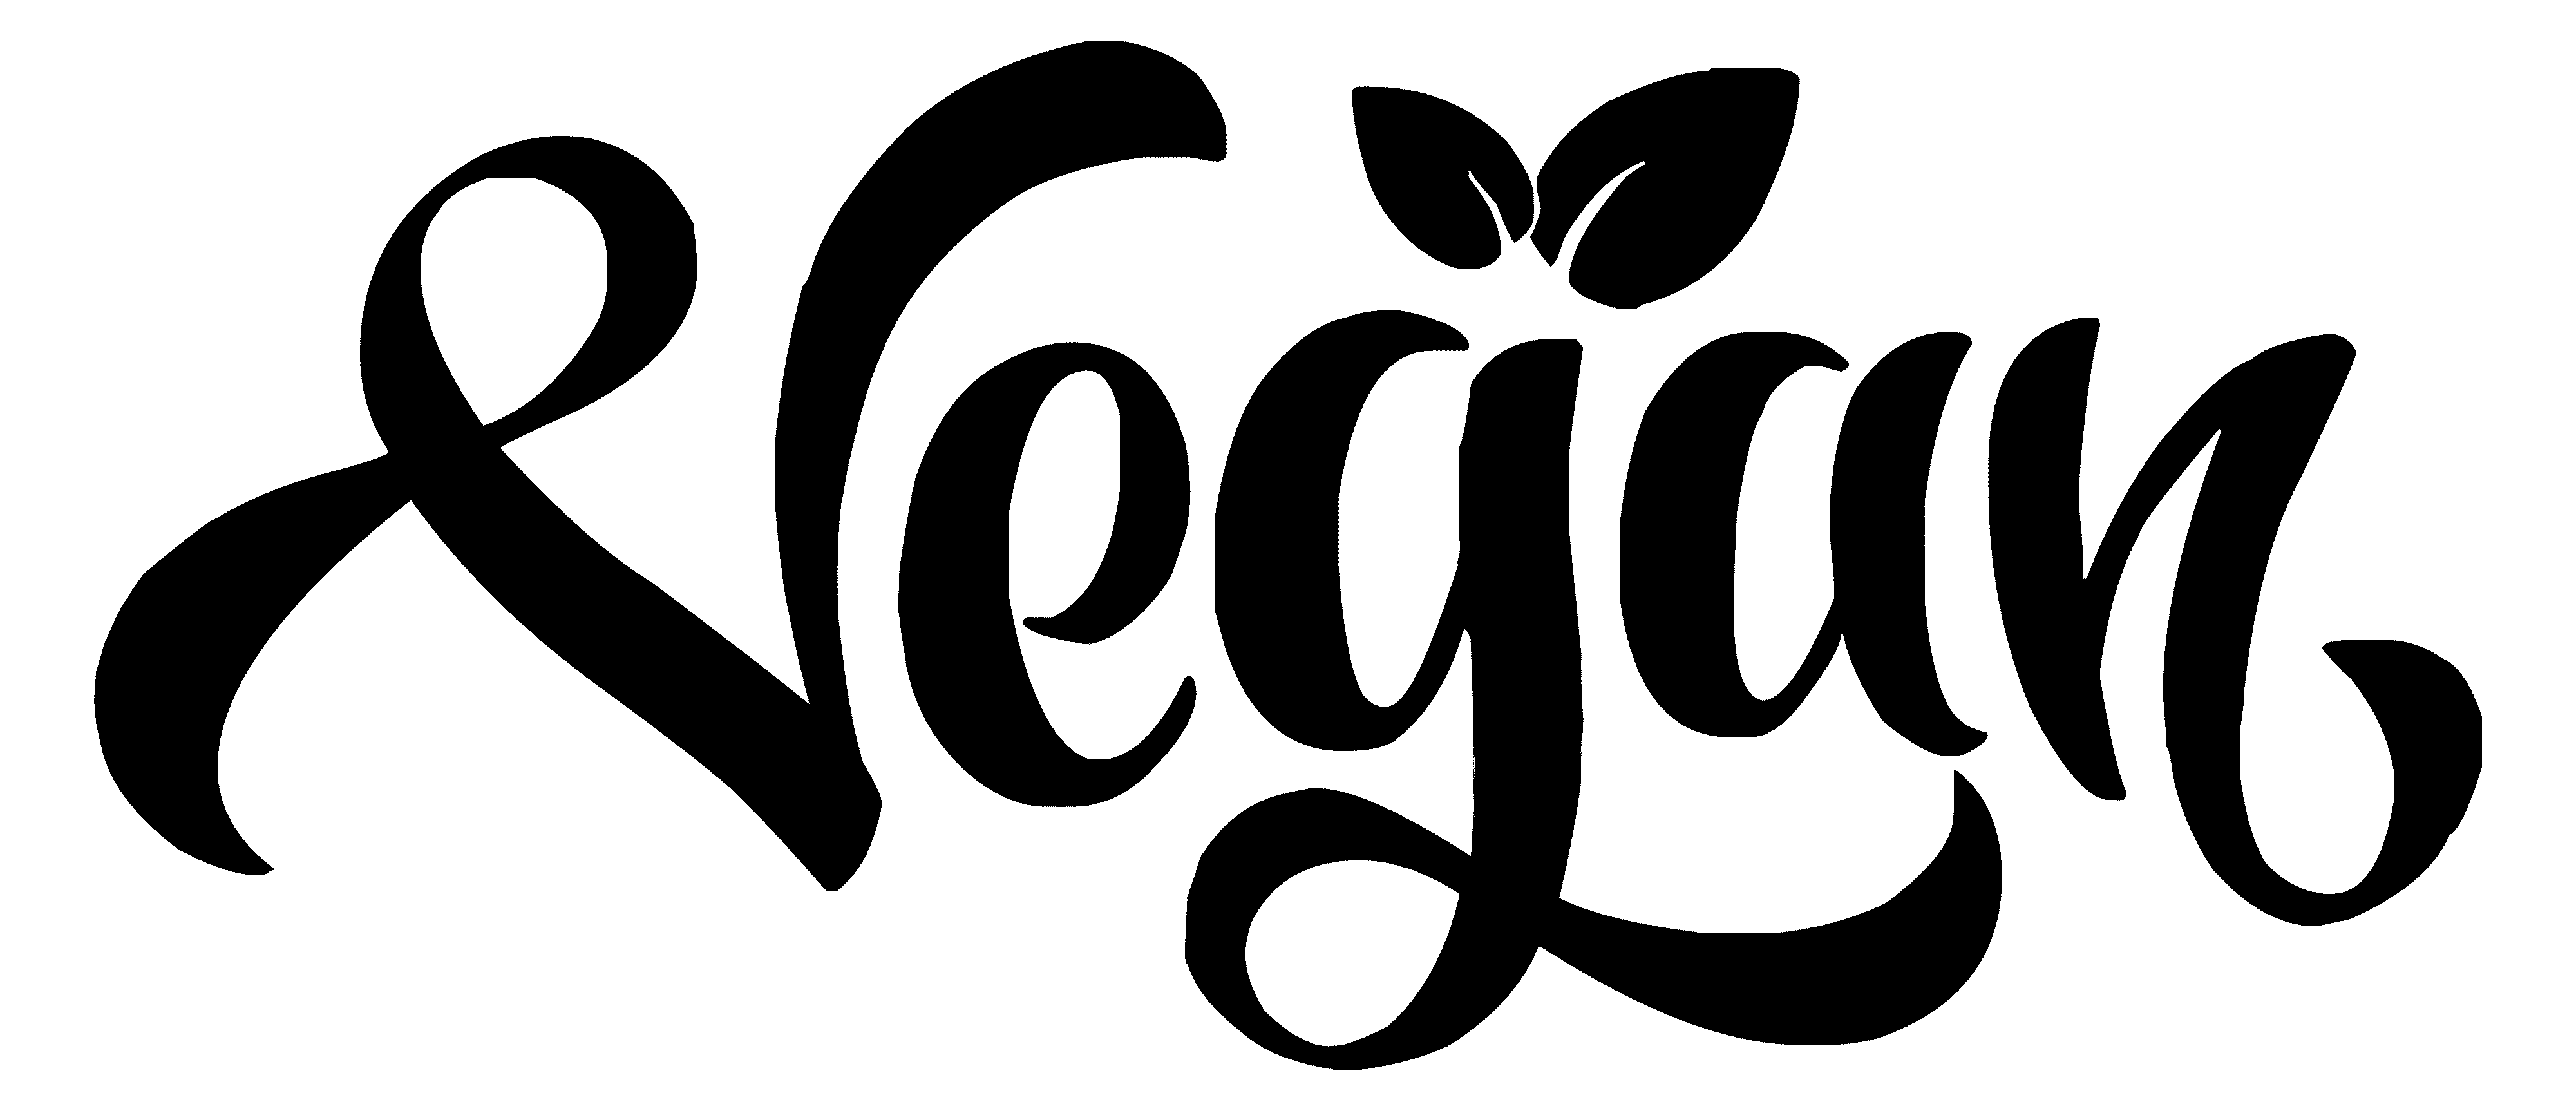 Vegan Symbols Emojis Copyright Free Clipart